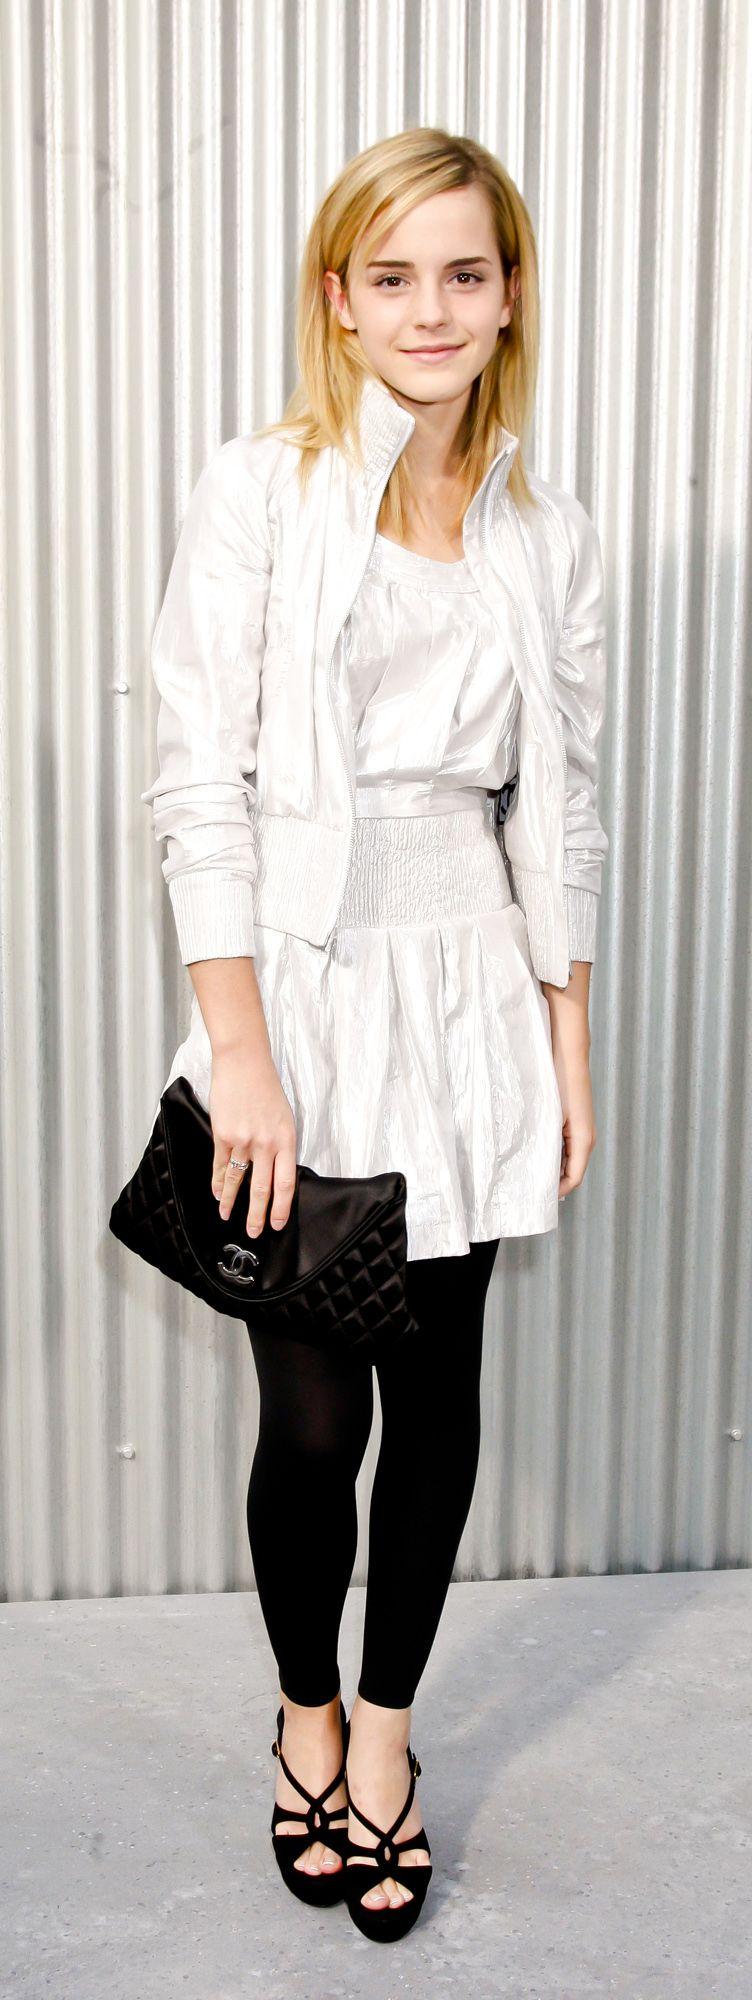 Emma Watson 2008 Chanel Fashion Show in Paris